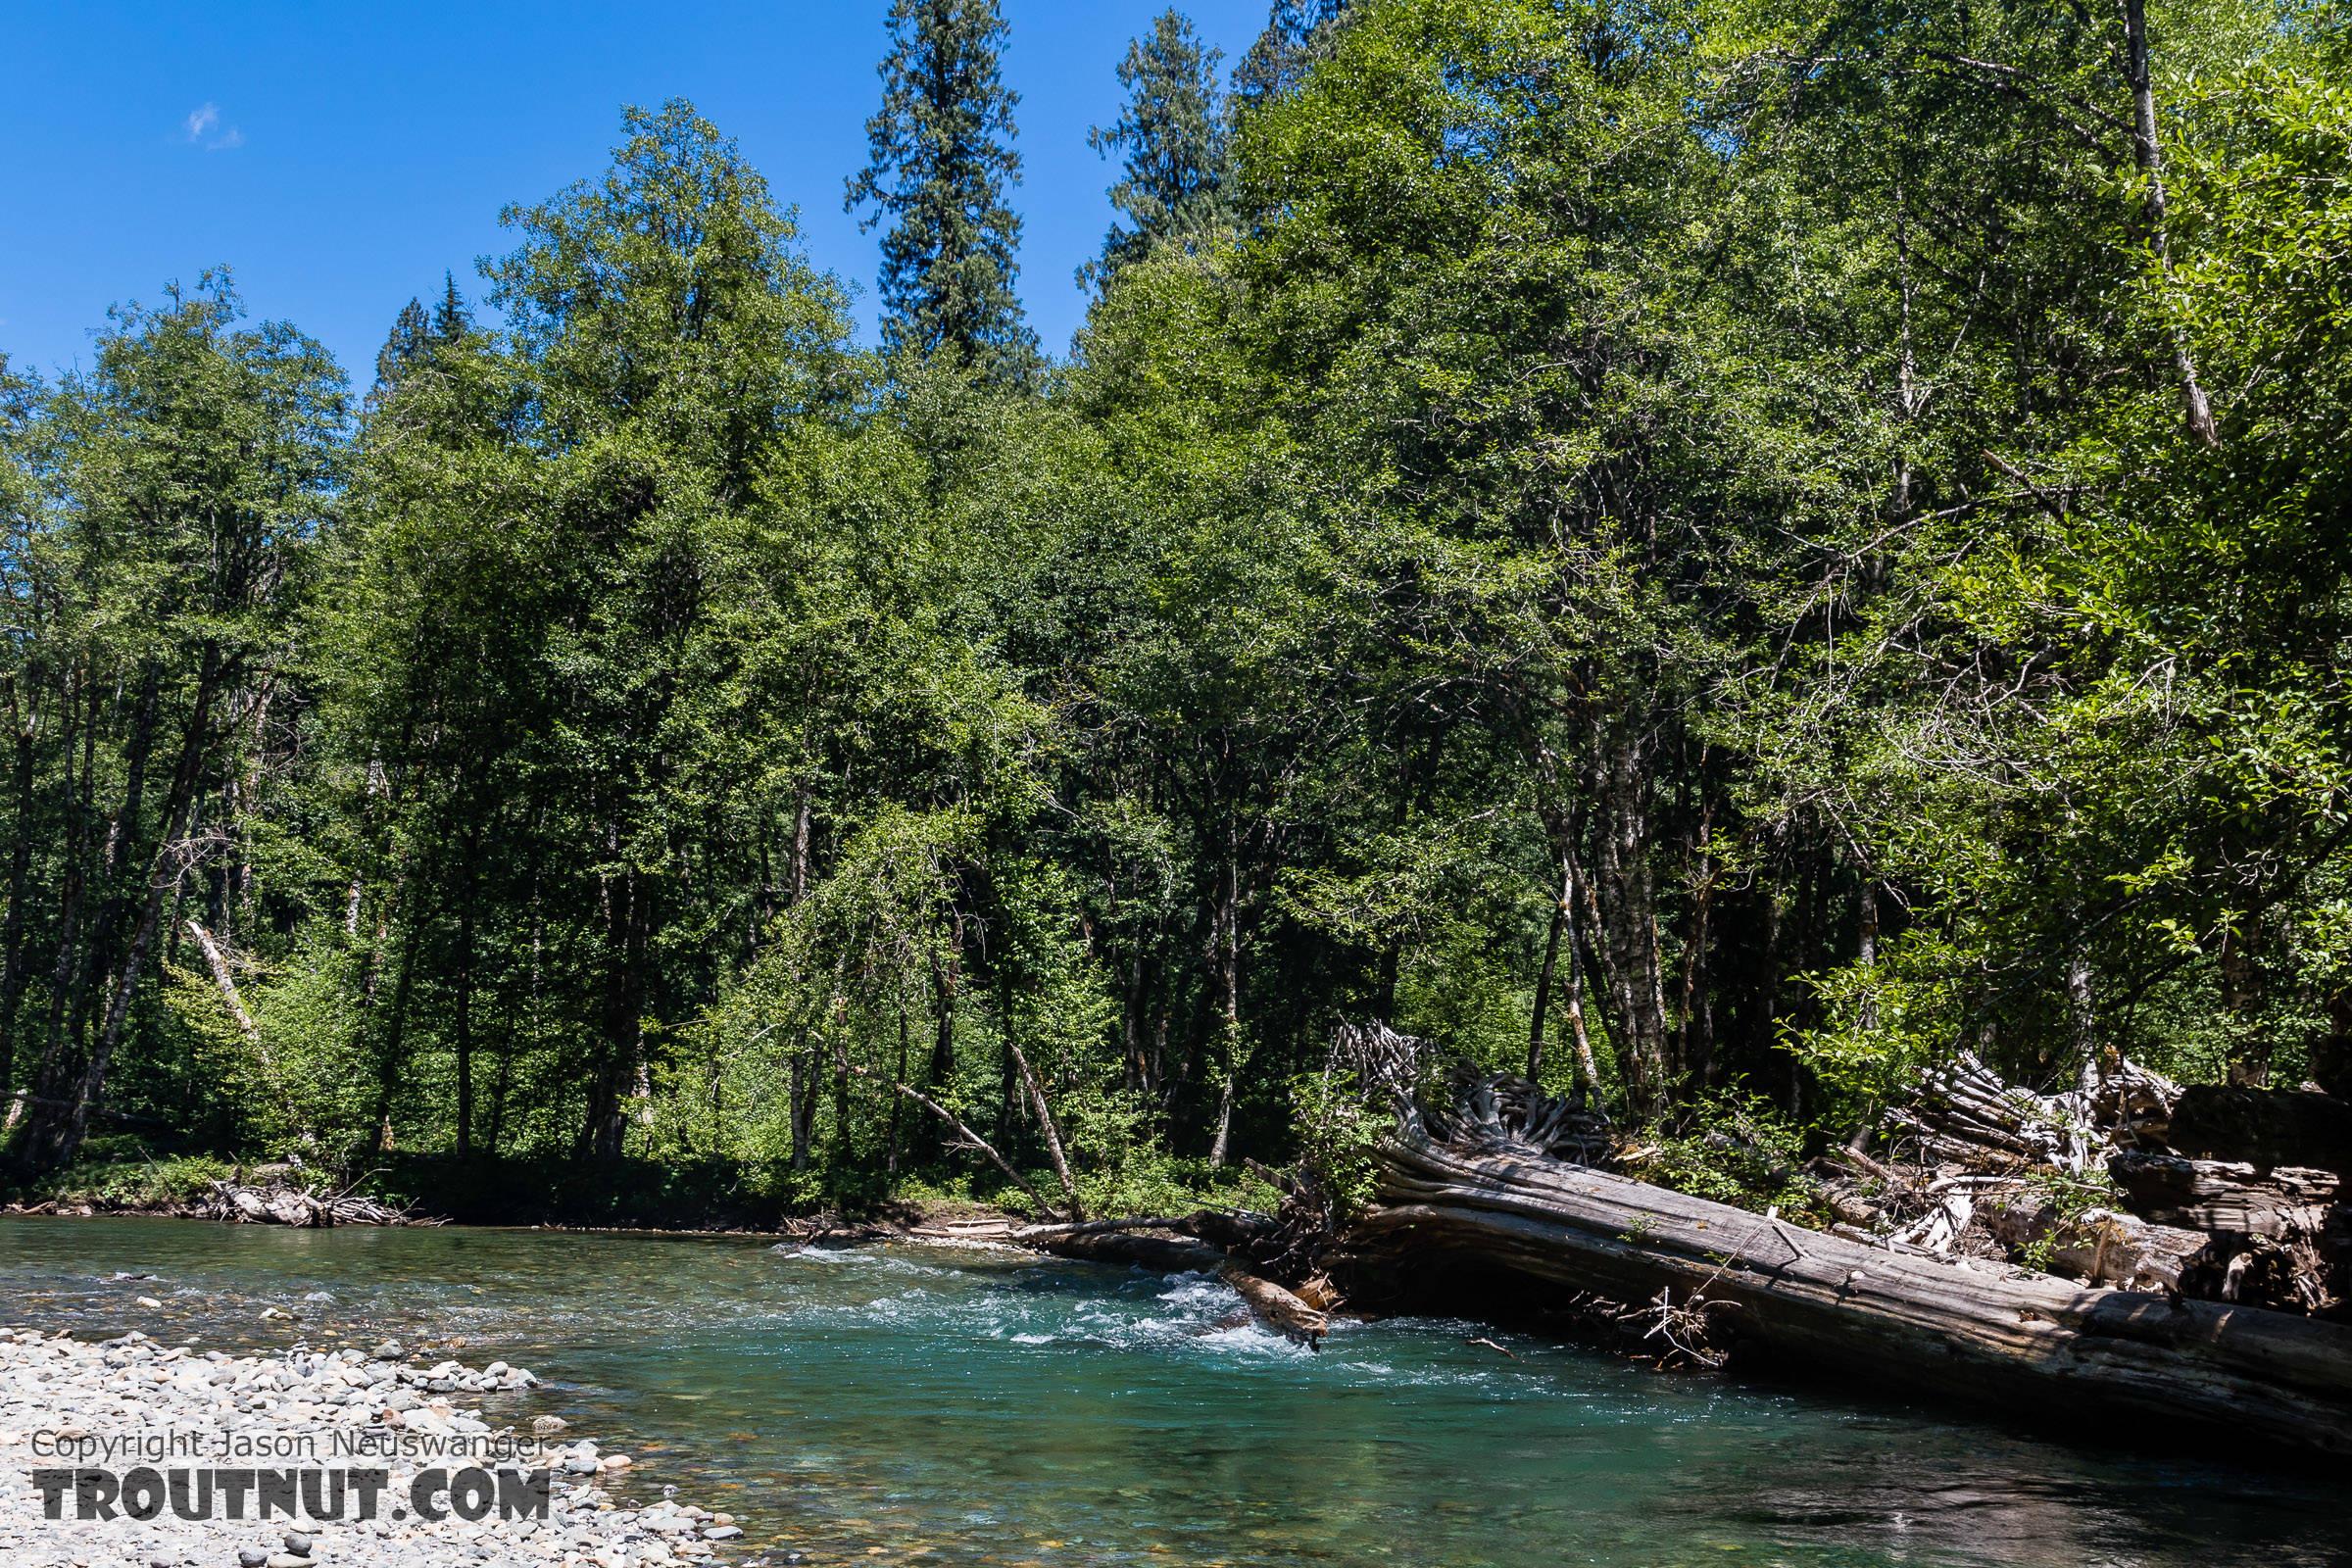 From the Ohanopecosh River in Washington.